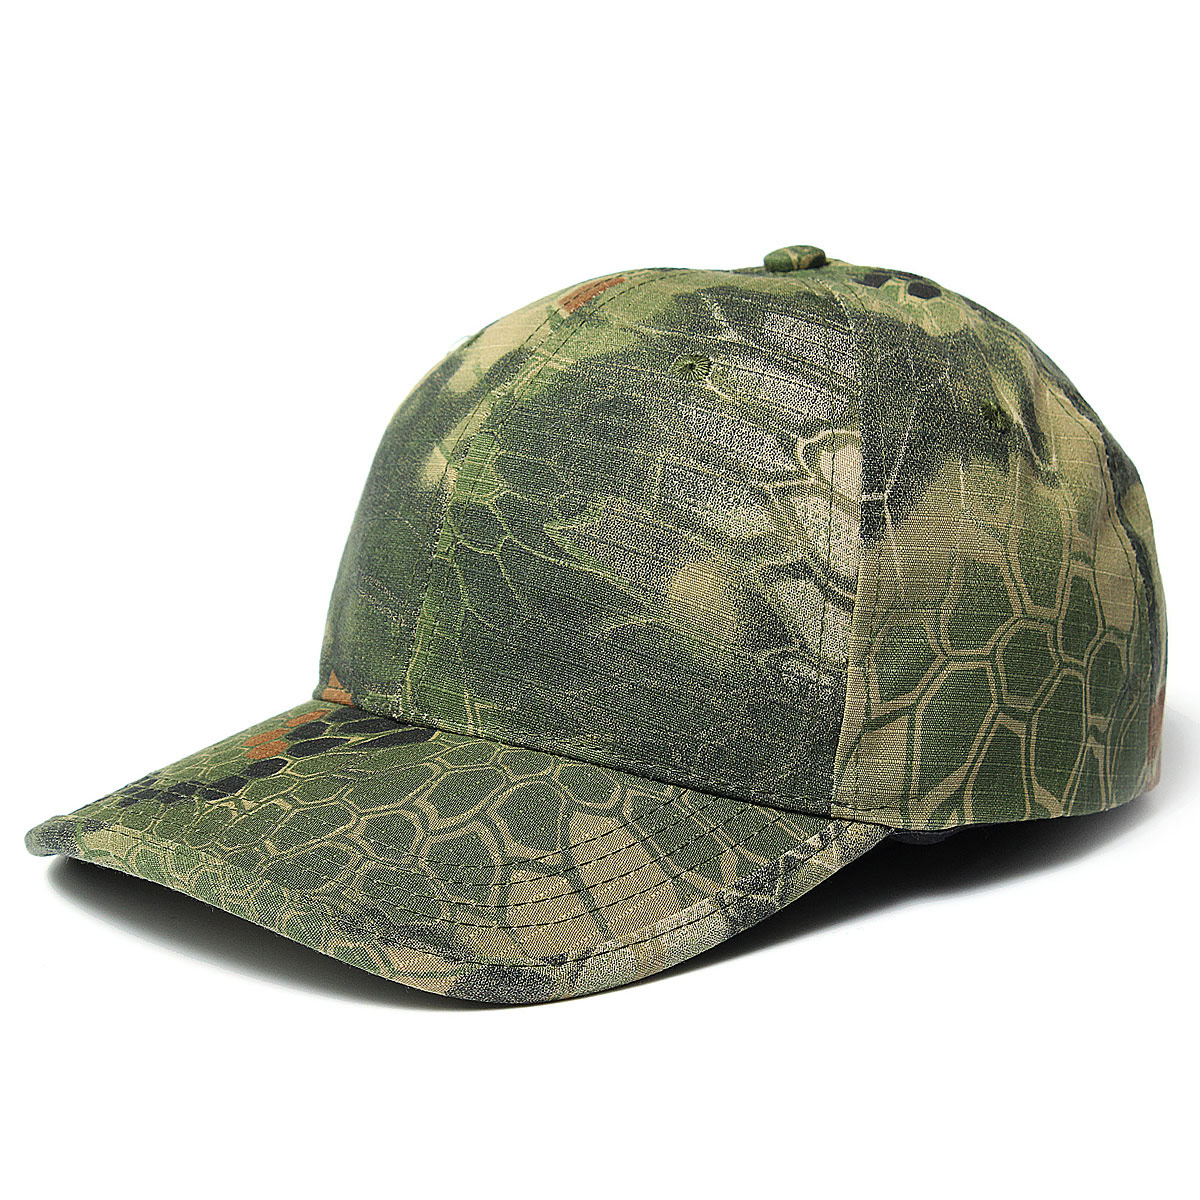 Men women camo cap adjustable velcro military hunting for Camo fishing hat